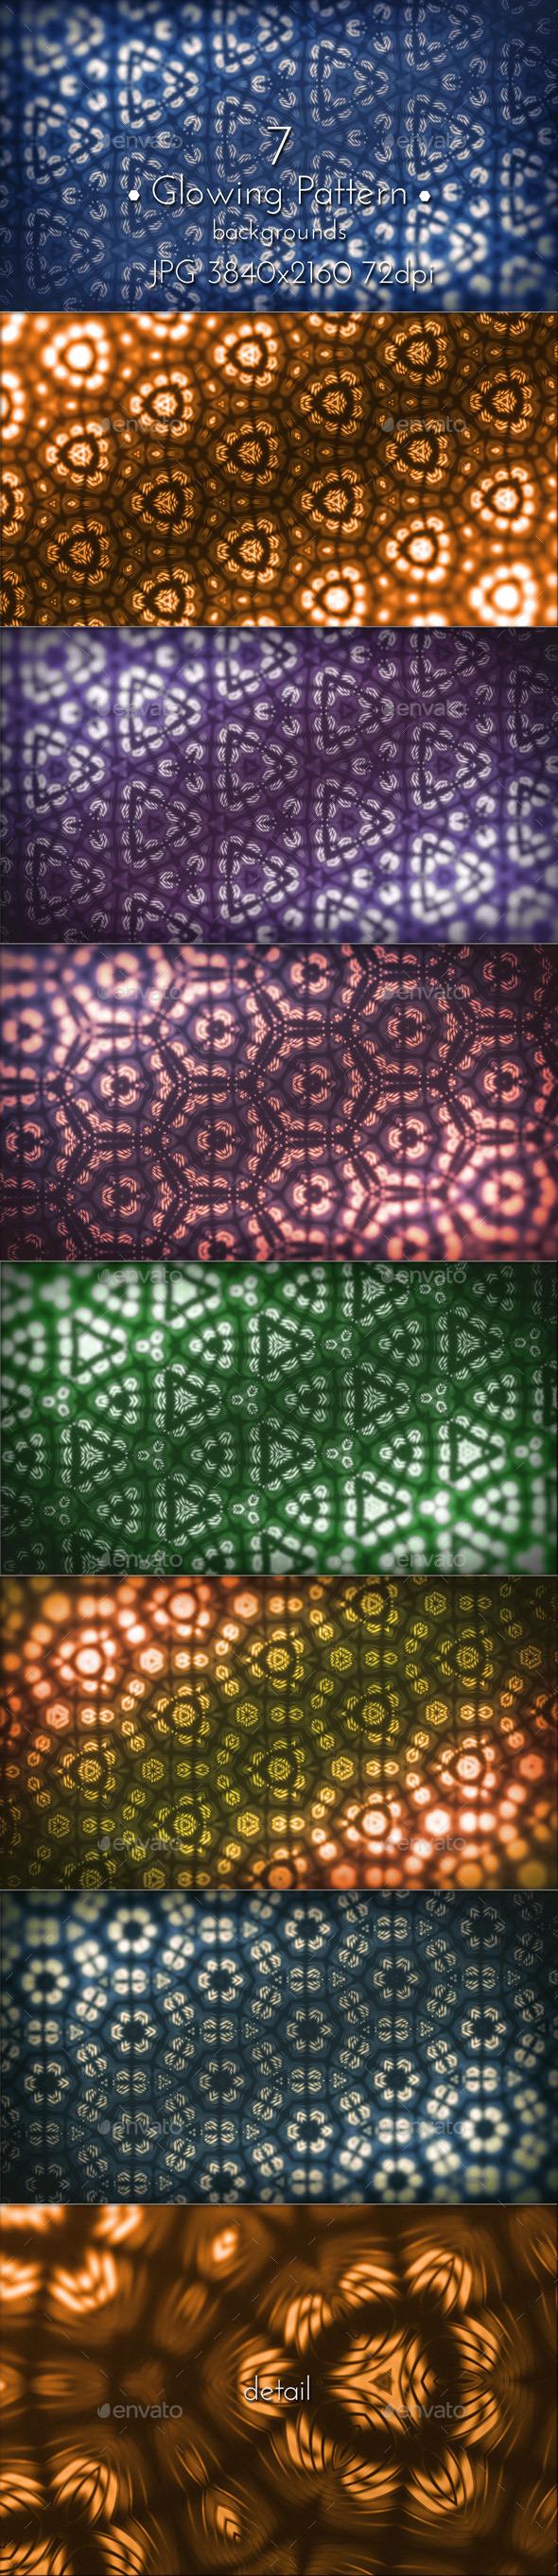 Glowing Pattern Background - Patterns Backgrounds